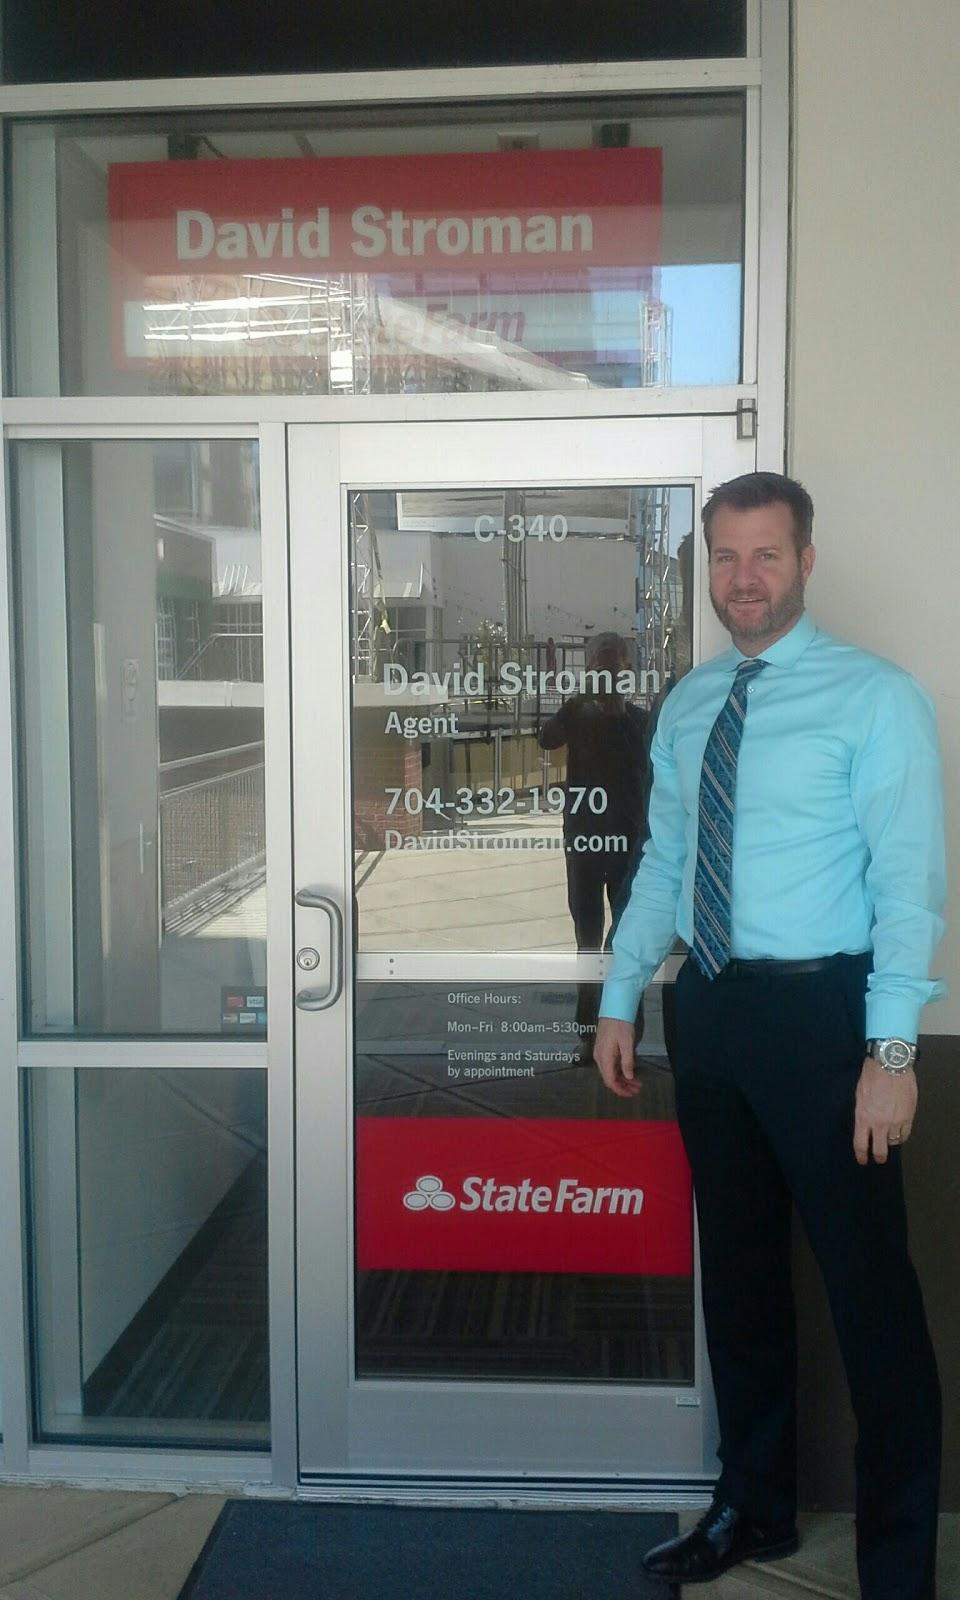 David Stroman - State Farm Insurance Agent | insurance agency | 210 E Trade St Suite C-340, Charlotte, NC 28202, USA | 7043321970 OR +1 704-332-1970